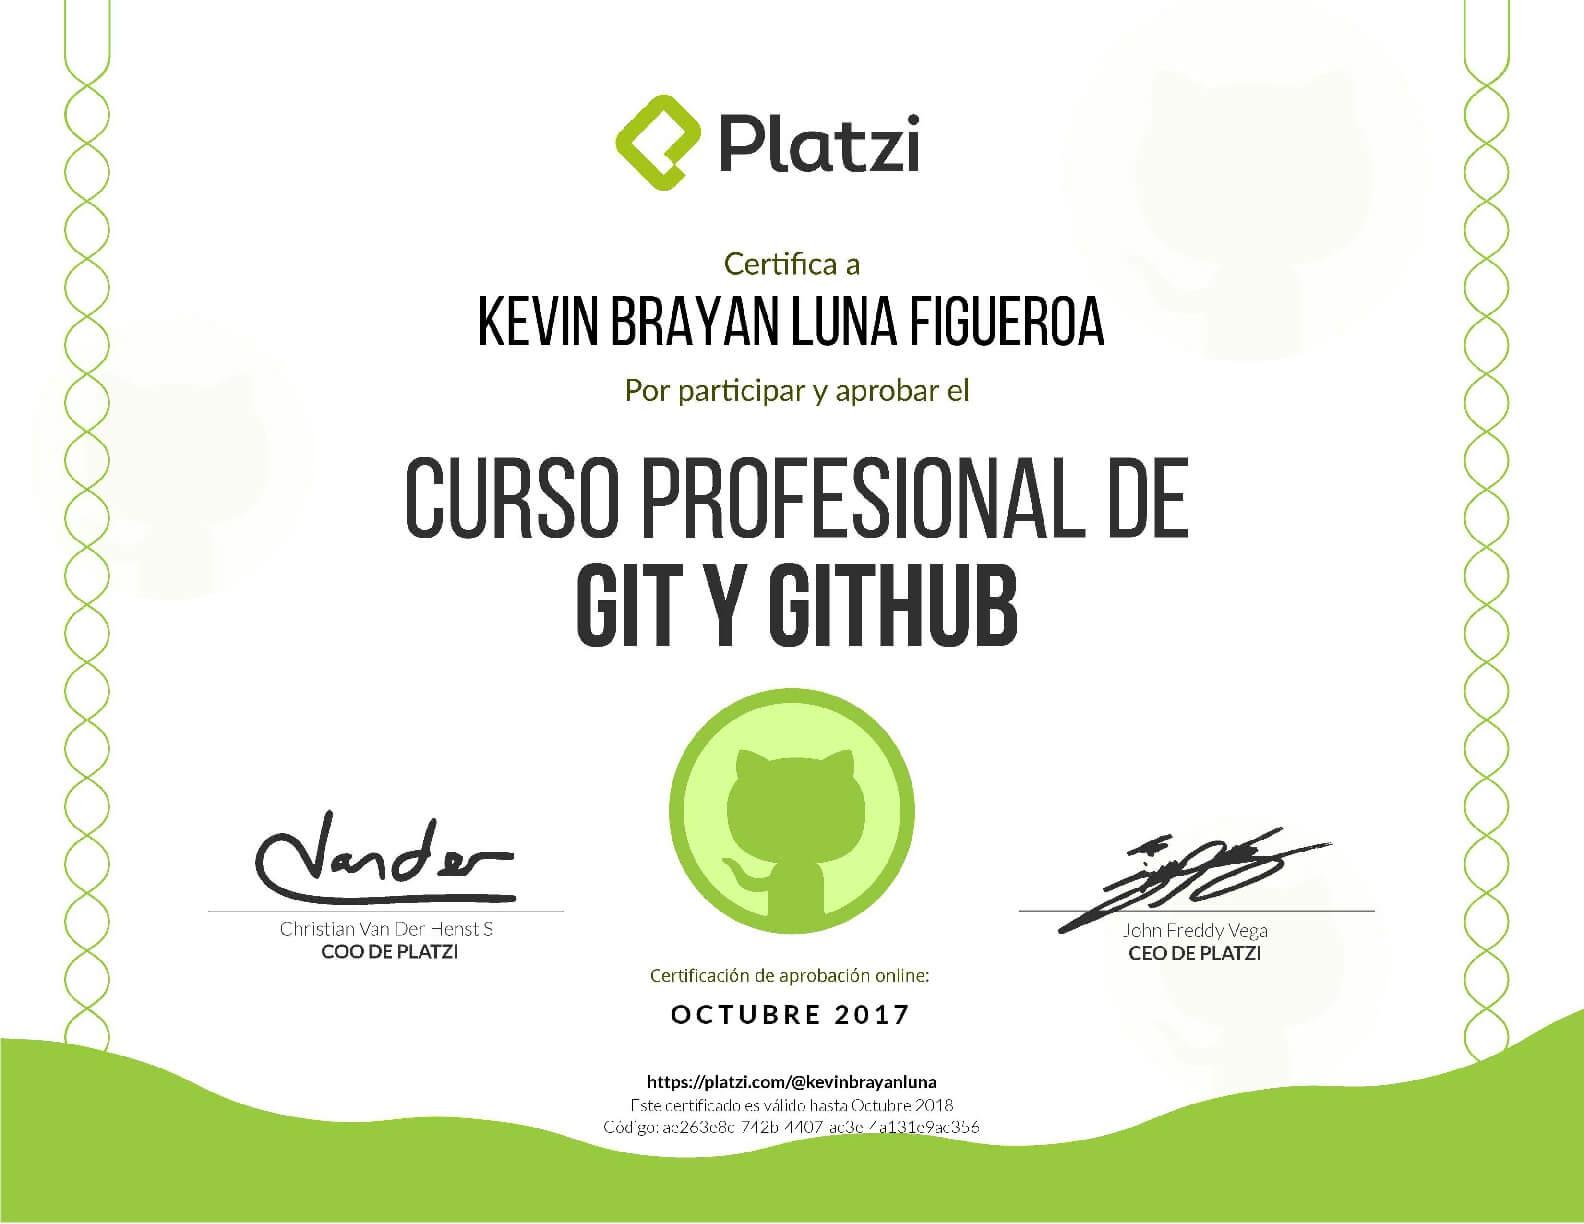 certificación platzi de Git y Github